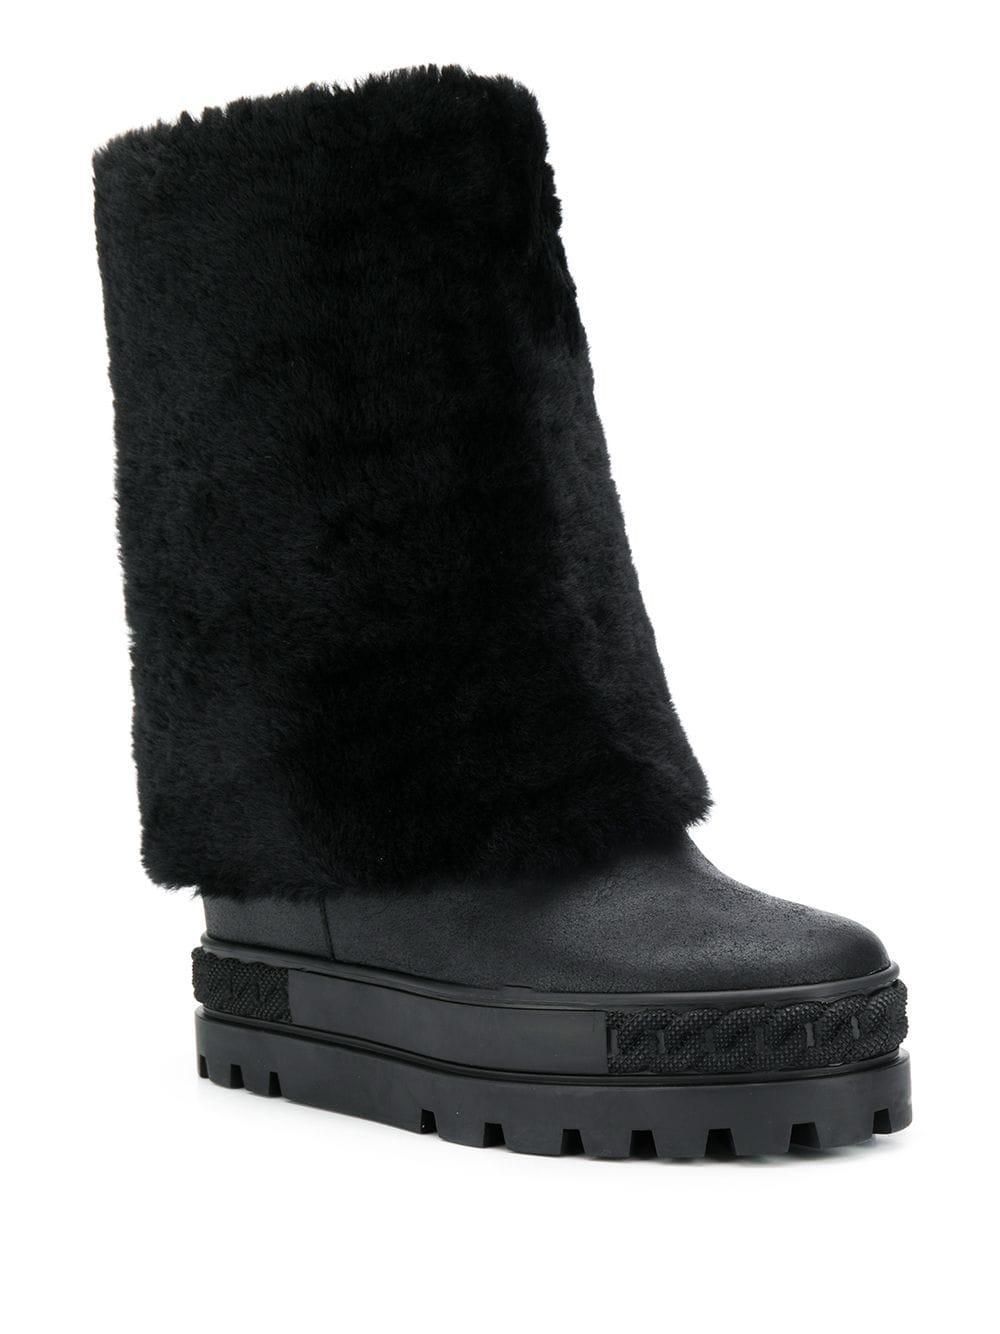 Casadei Leather Flatform Boots in Black